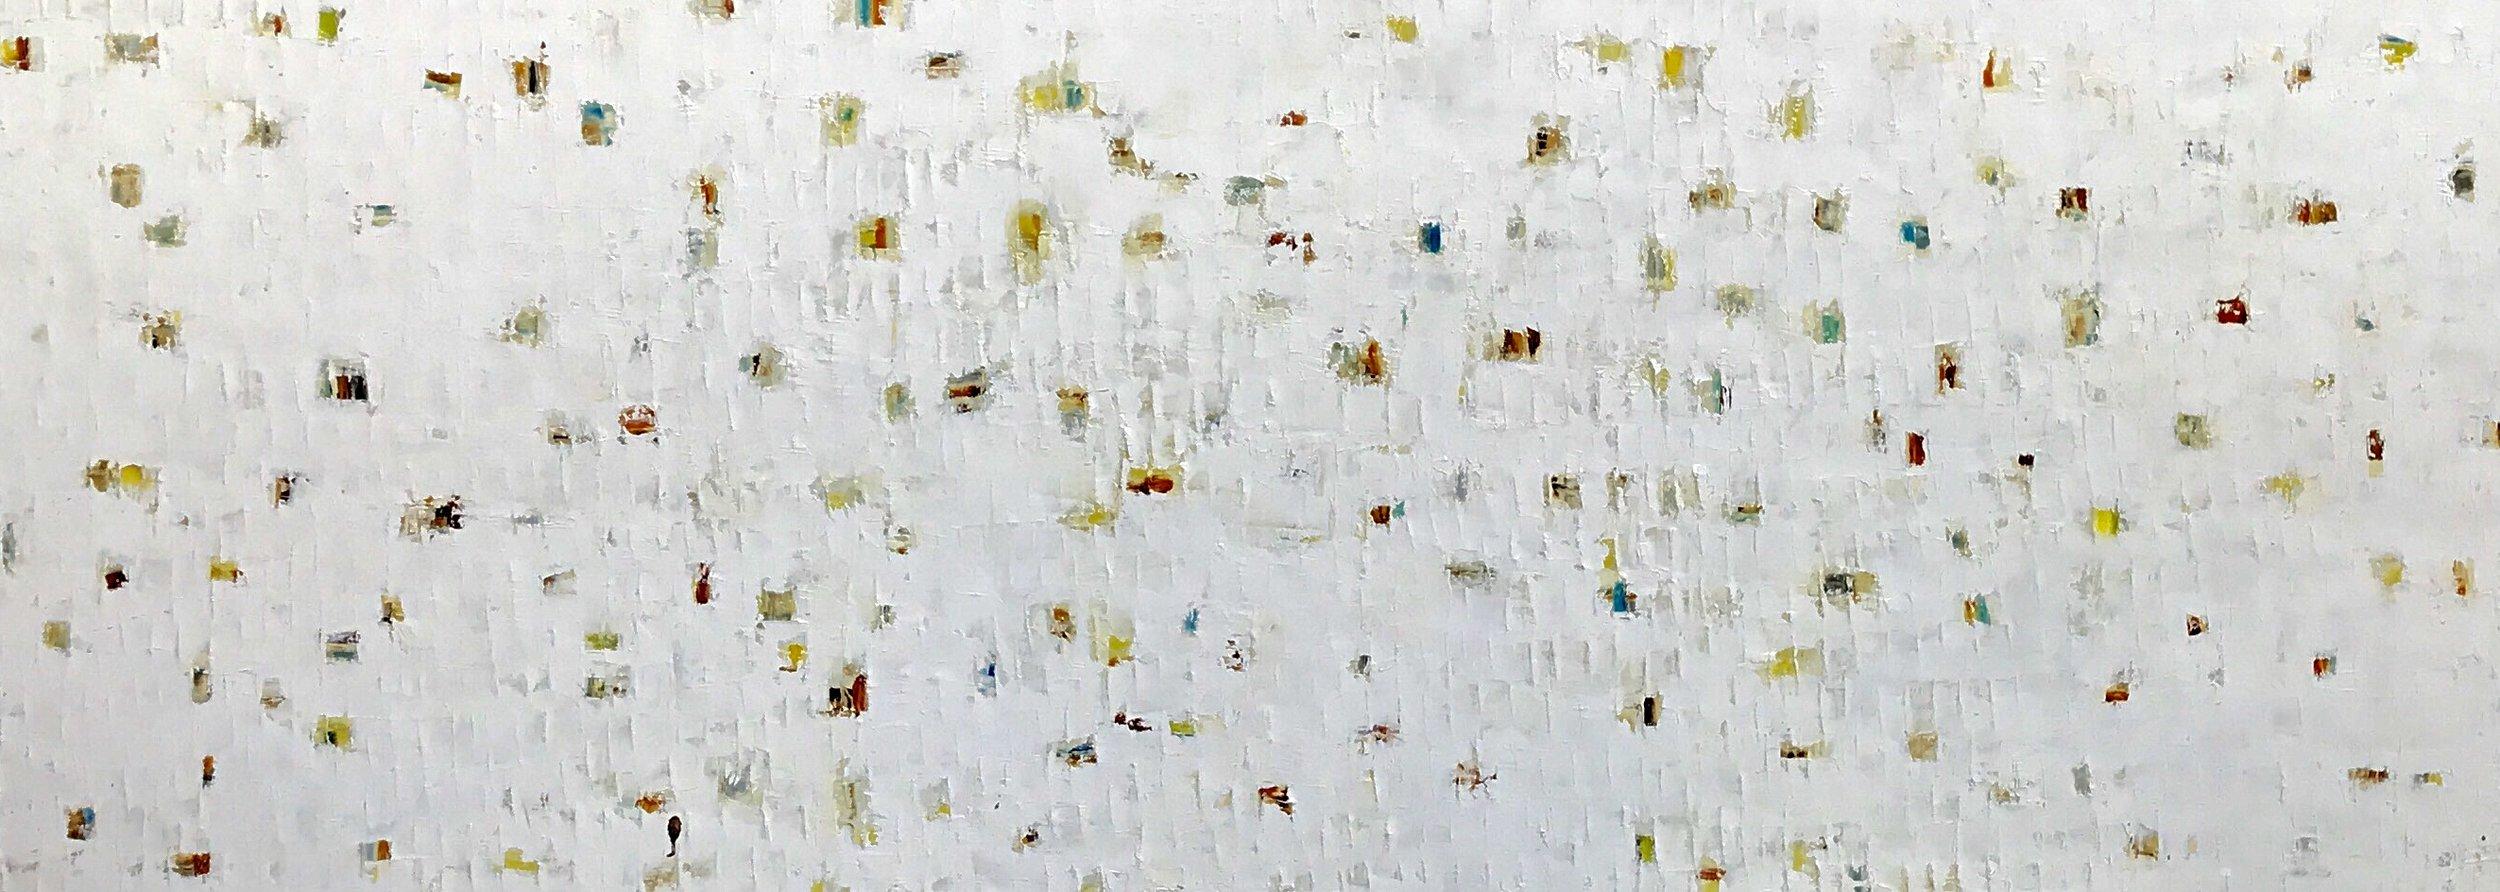 """Winter in Oslo"" 36""x 96""x 2.5"", oil on canvas"